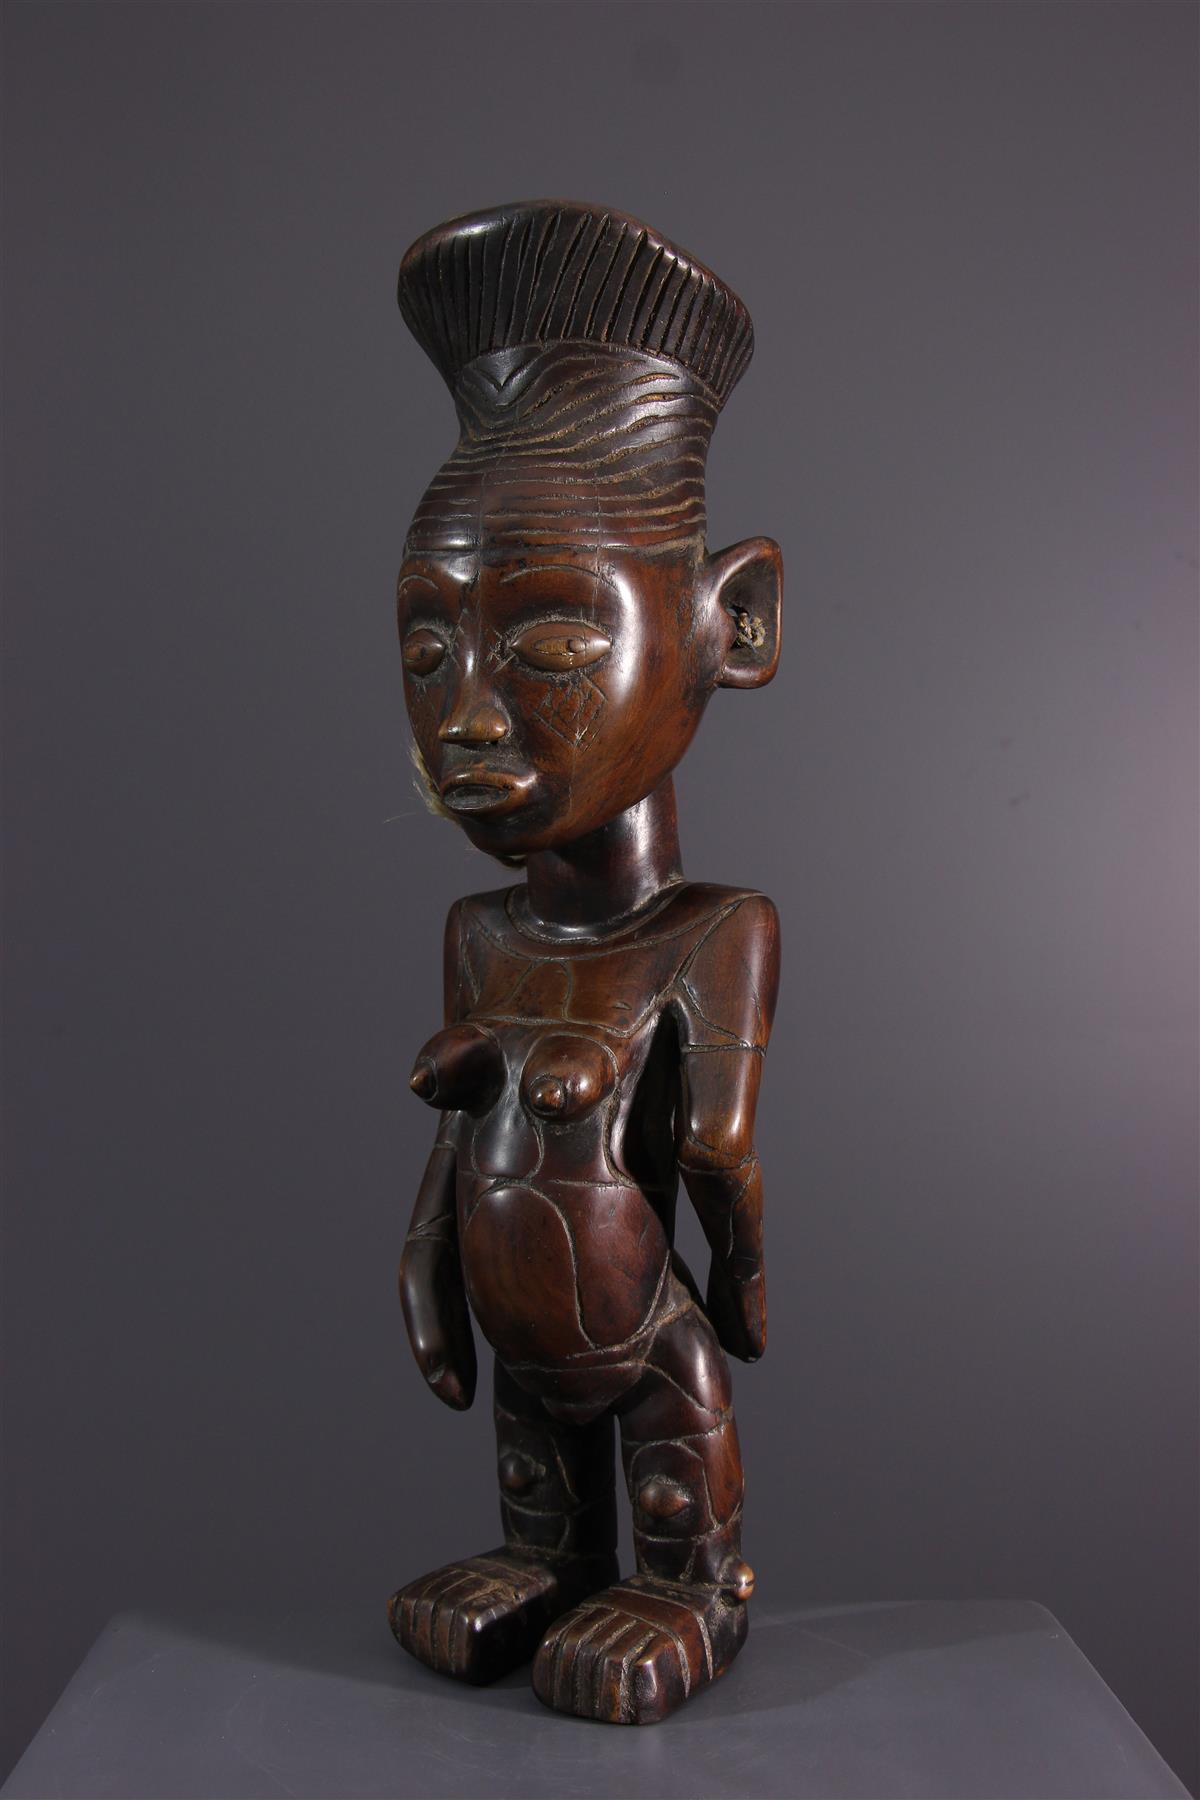 Mangbetu figure - Tribal art